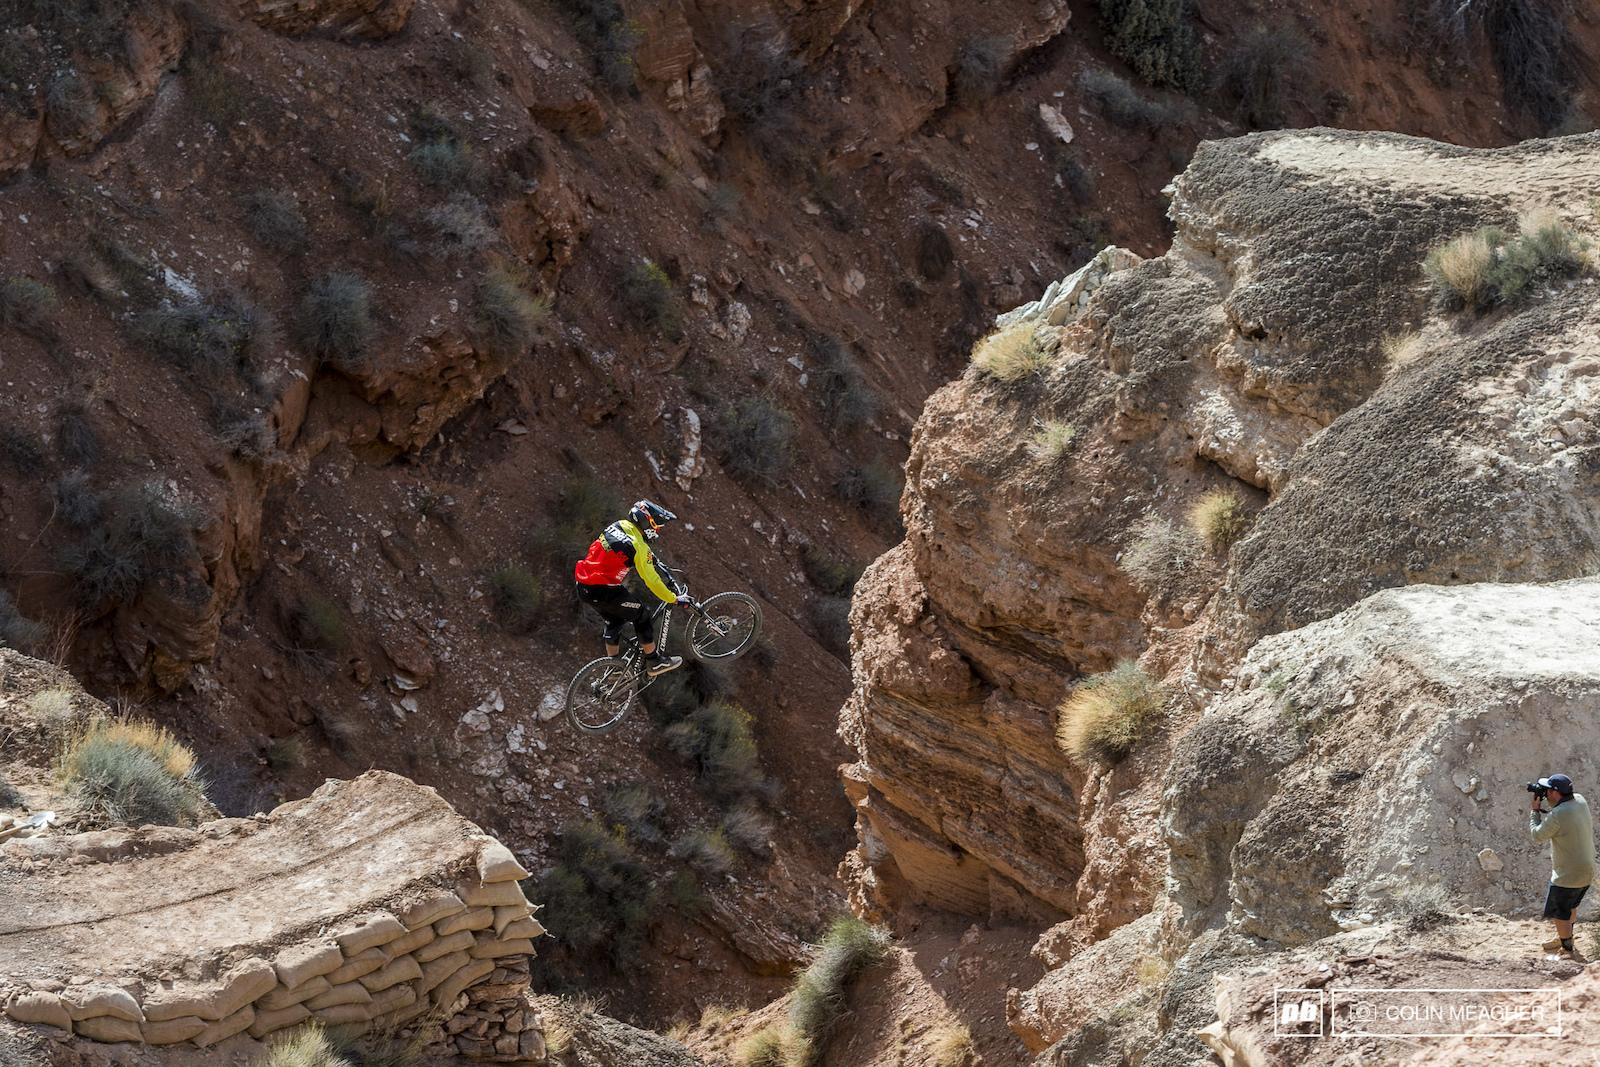 Guniea Pig runs are always nerve wracking. Kyle Strait givin er on his canyon gap.